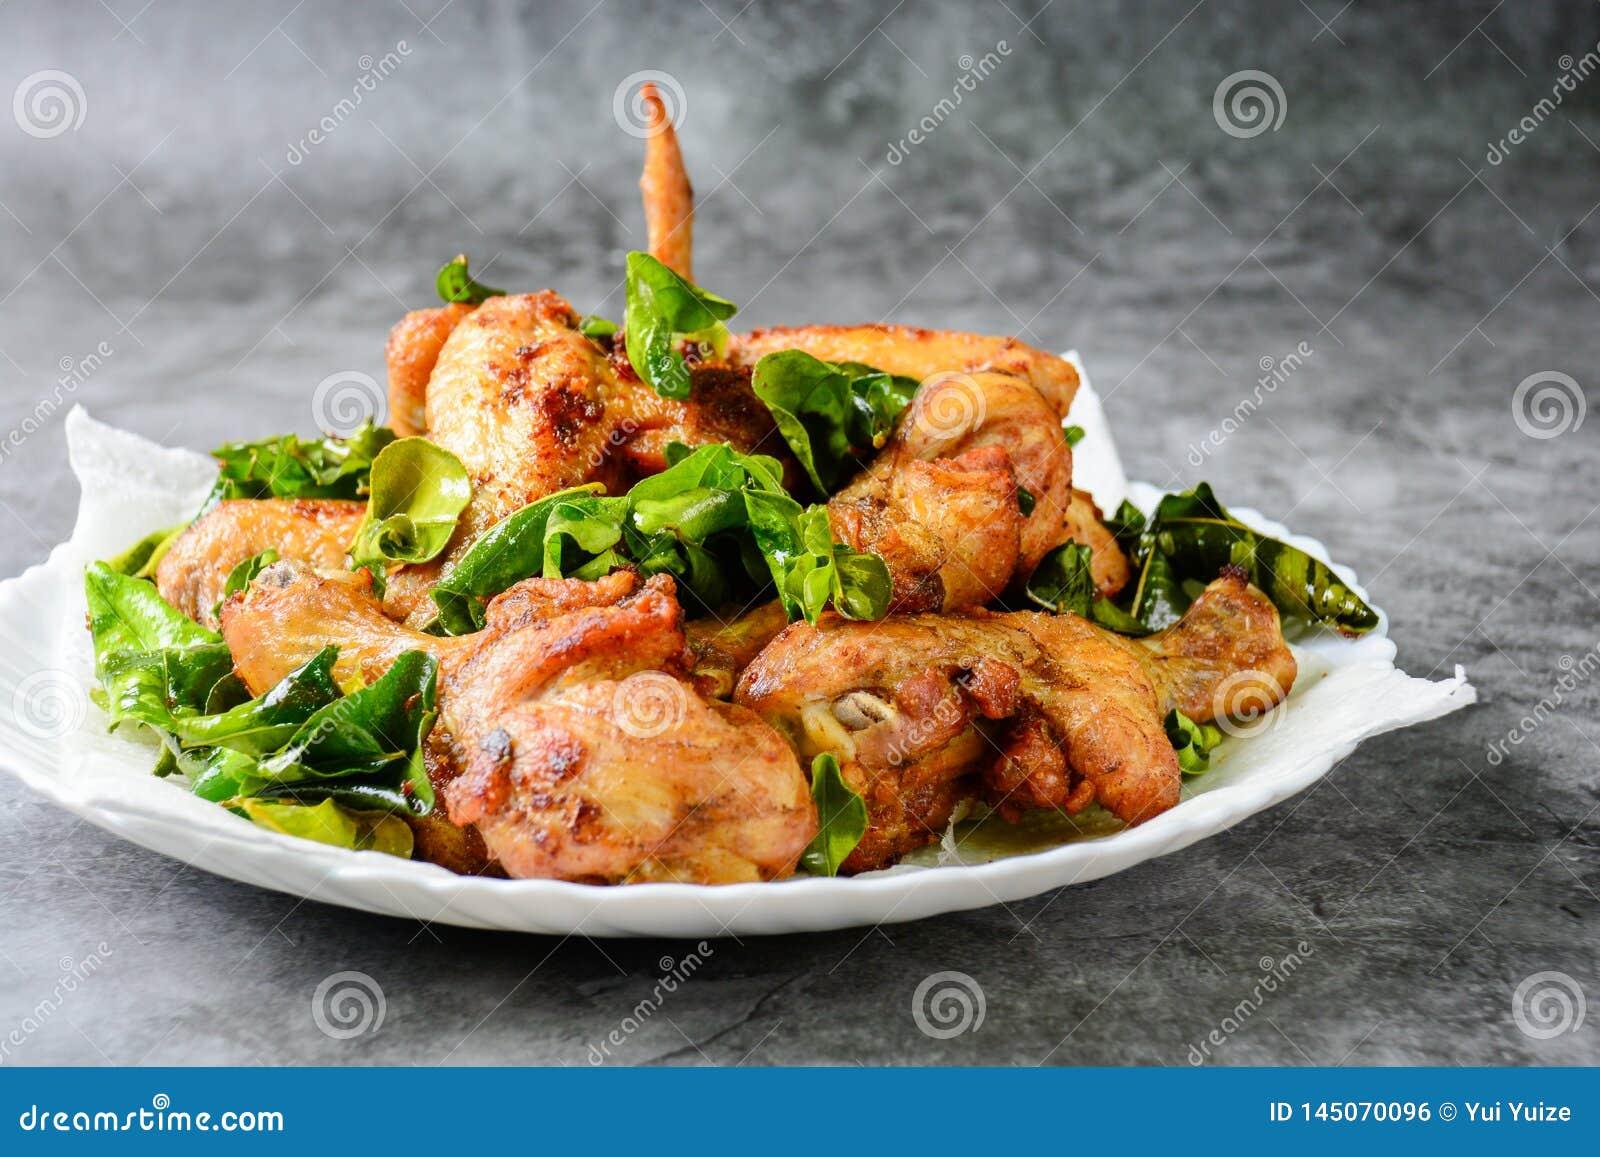 Gebratene knusperige Hühnerflügel mit Kräutern